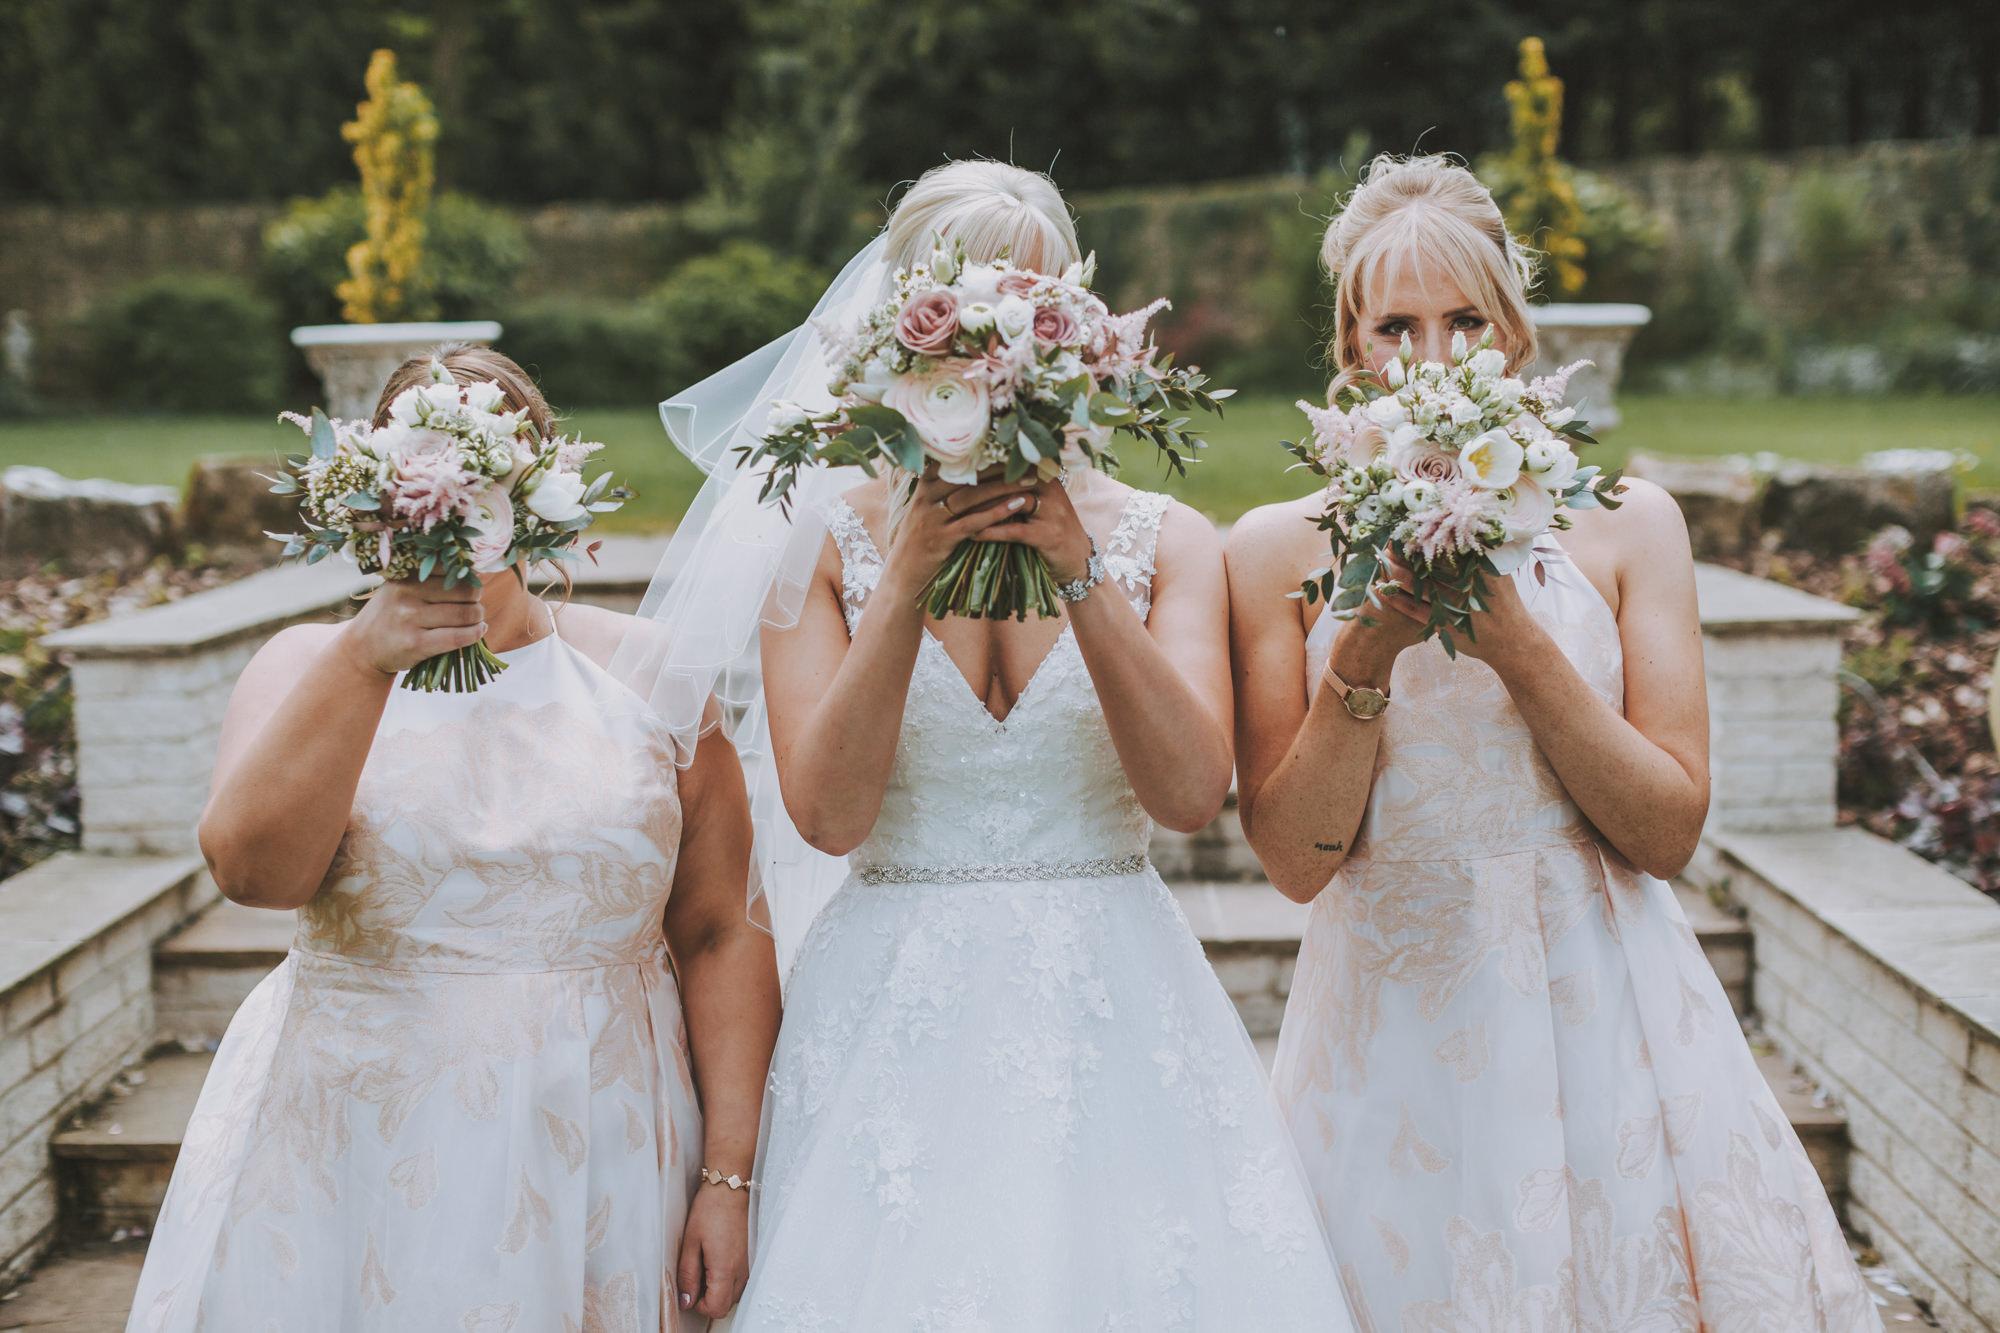 hellaby hall wedding photographers in rotherham, yorkshire-46.jpg